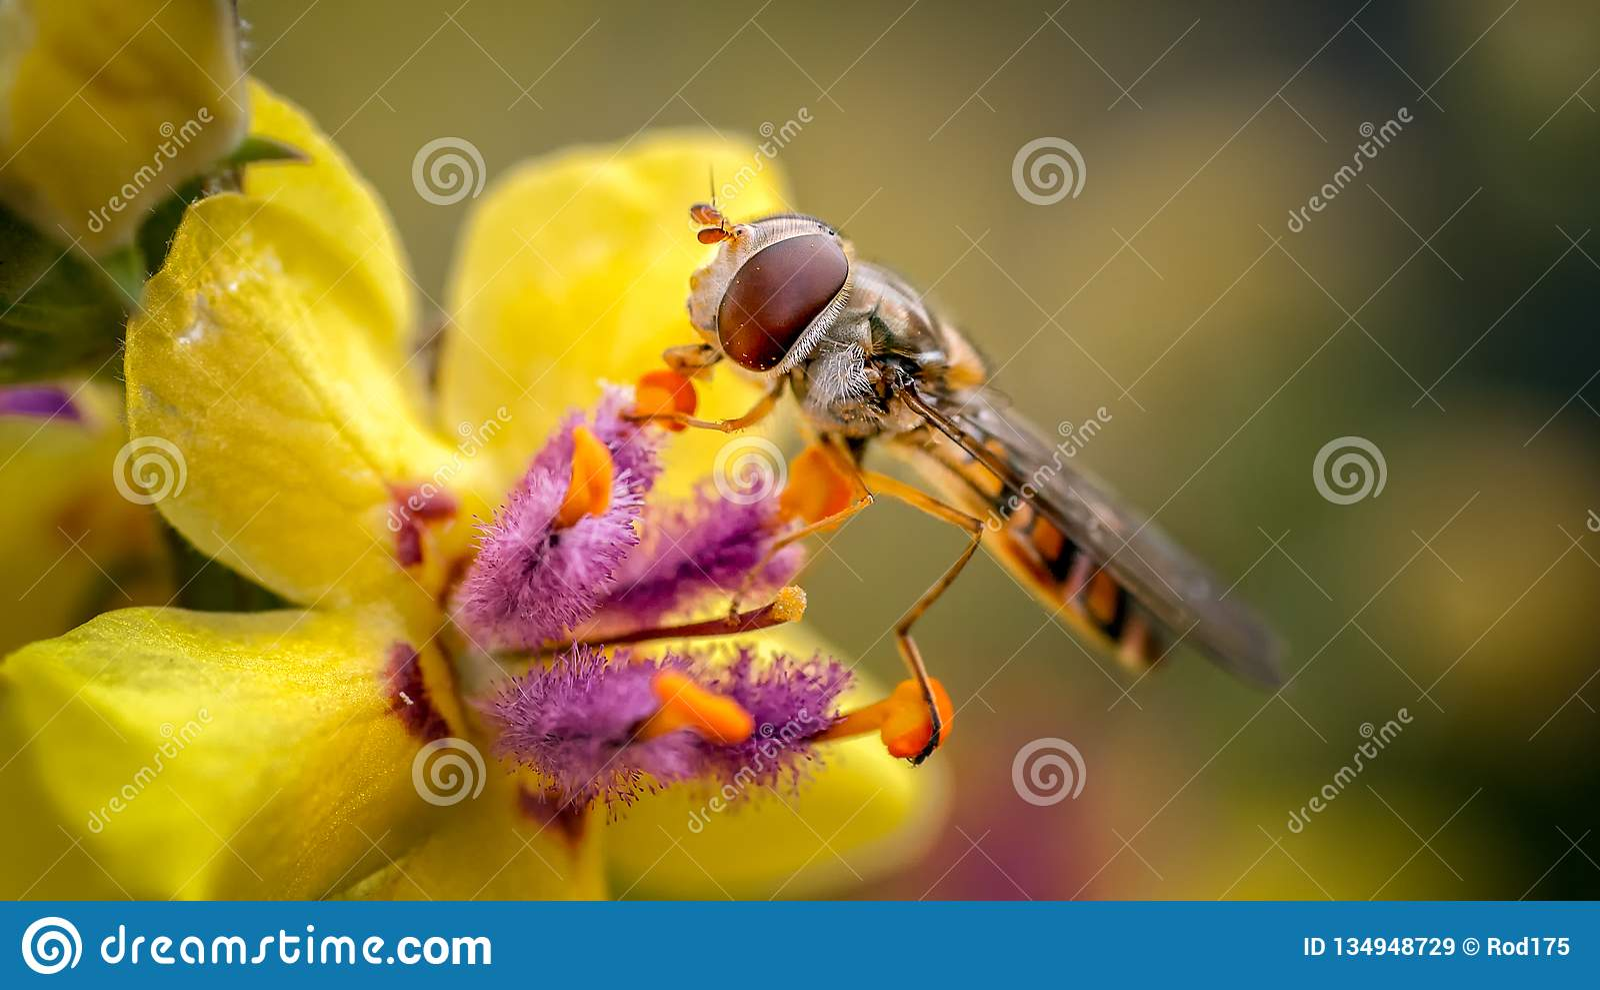 Marmelad Hoverfly, Episyrphus balteatus på Verbascum